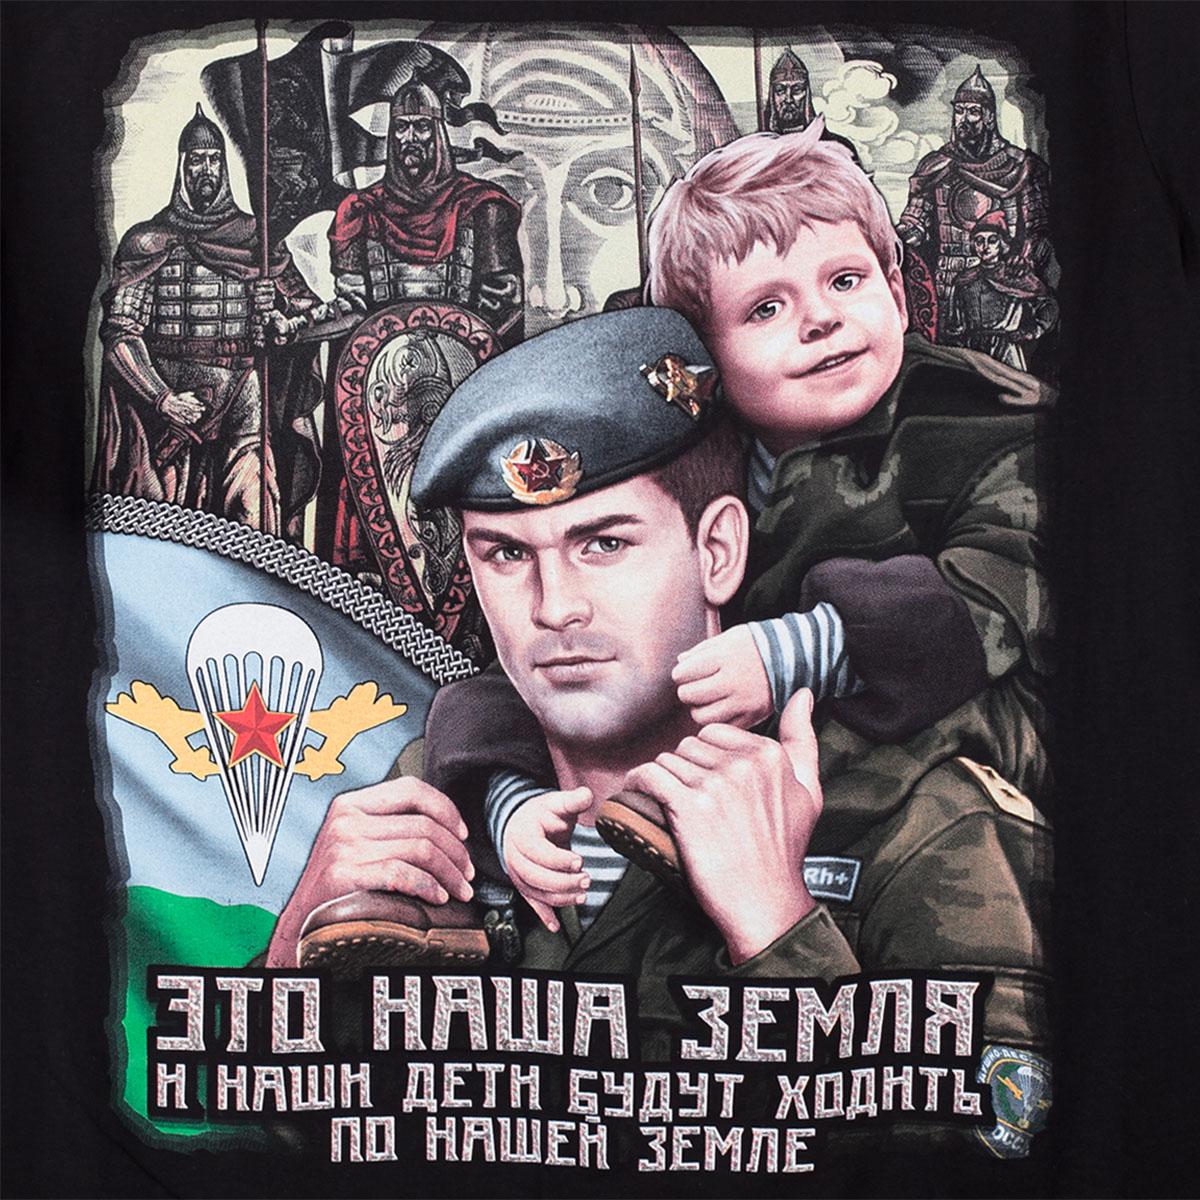 Рисунок на футболке - десантник с ребёнком